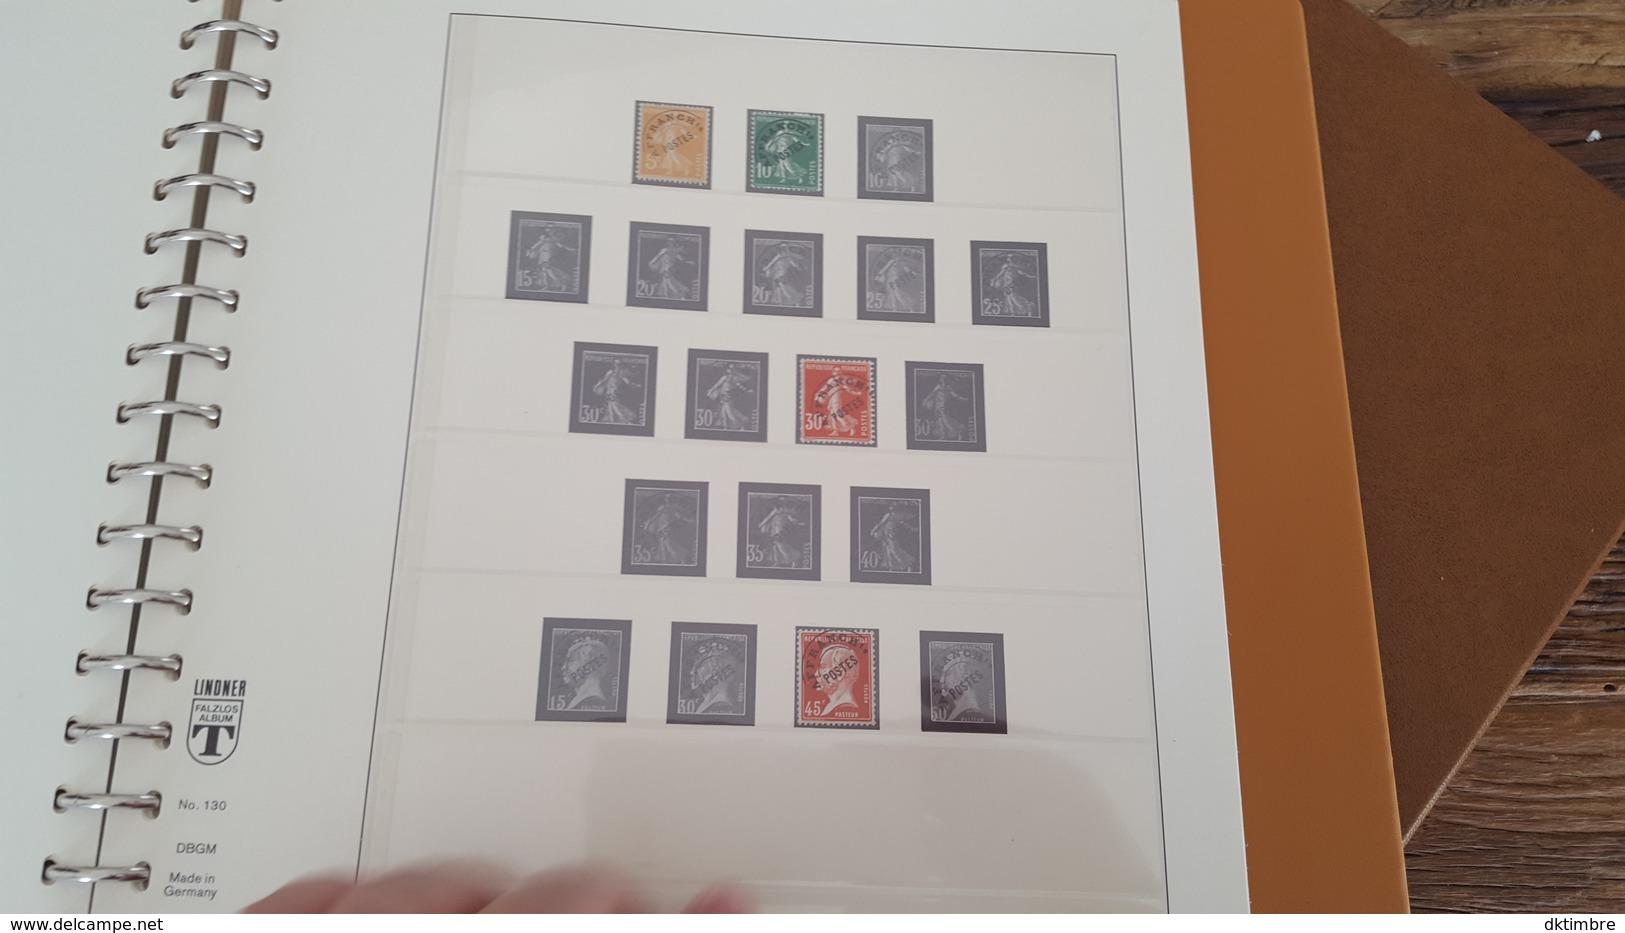 LOT 375678 ALBUM TIMBRE DE FRANCE LINDNER DE 1849 A 1940 TIMBRE NEUF* OBLITERE PORT A 10 EUROS - Briefmarken